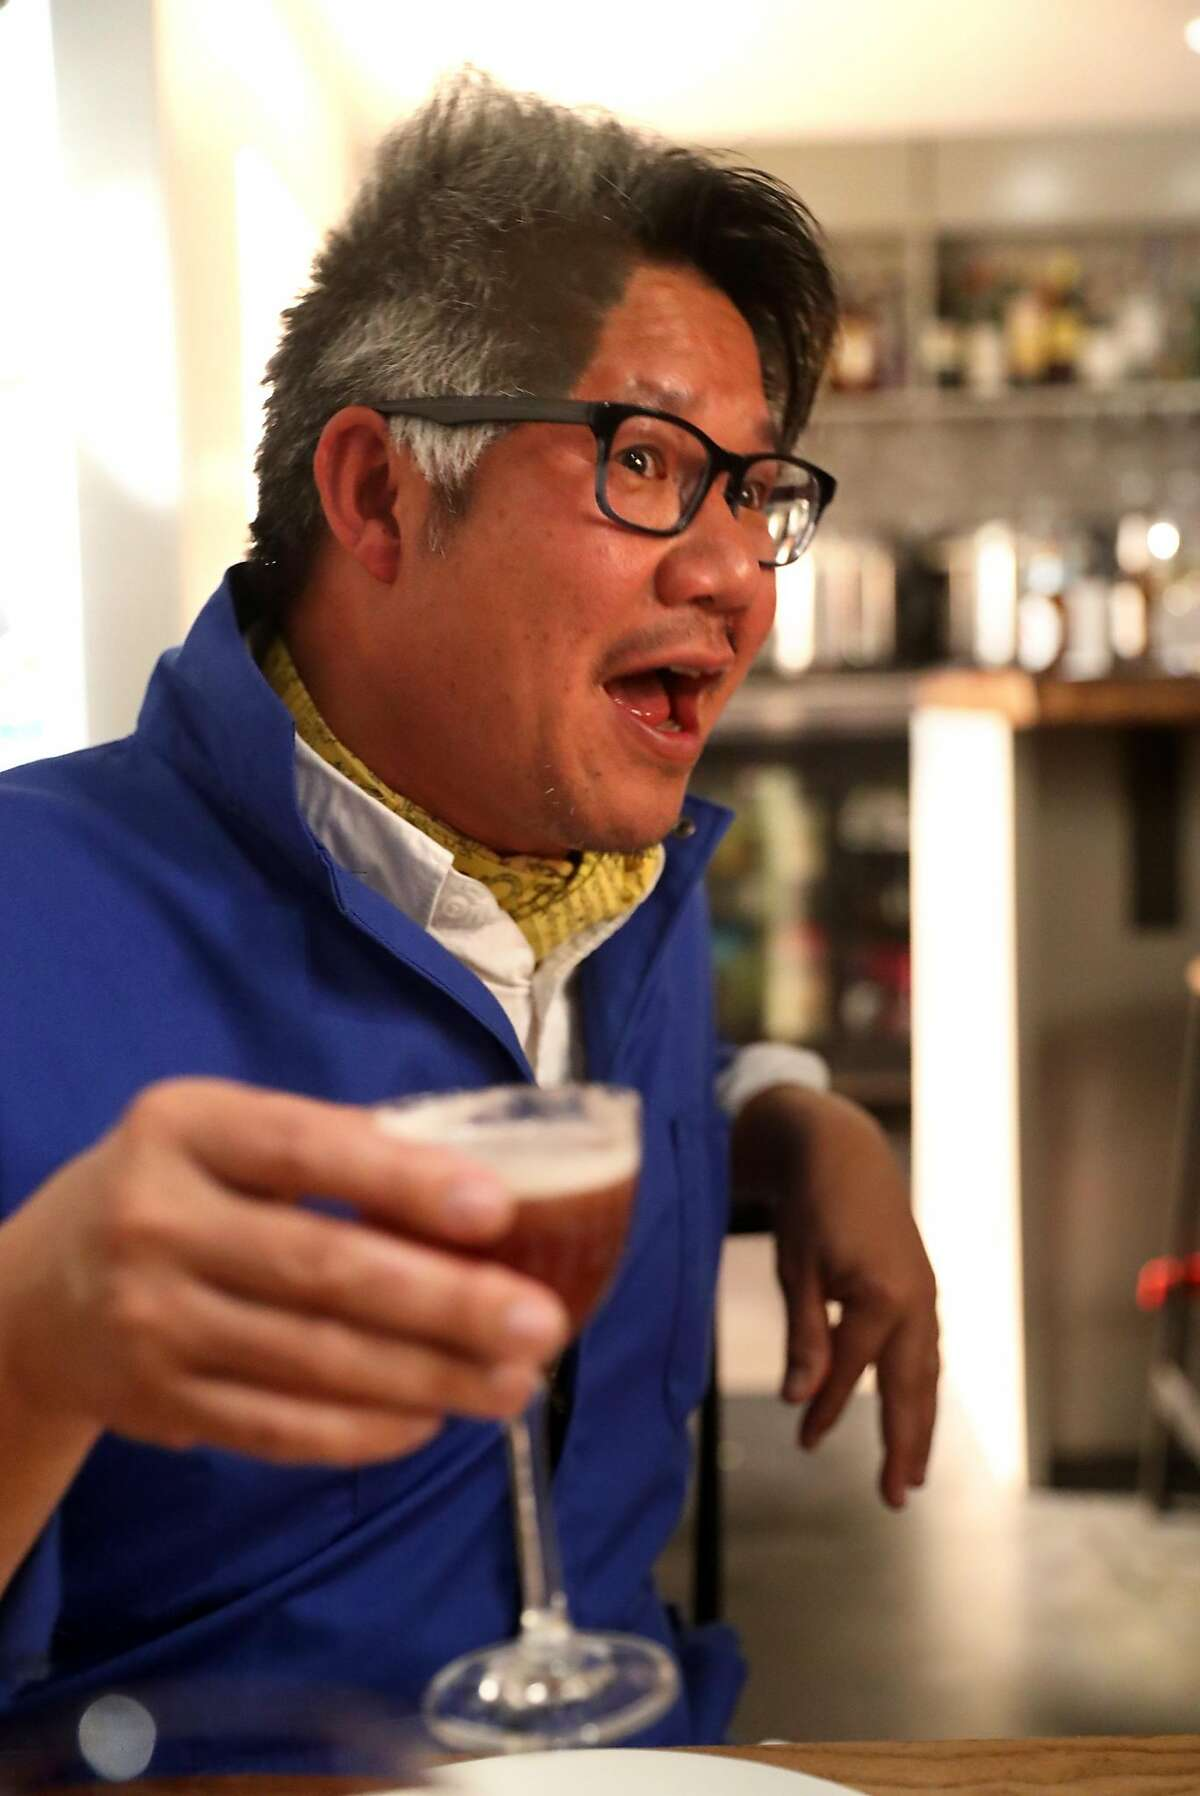 Architect Kulapat Yantrasast enjoys dinner at Kin Khao in San Francisco, Calif., on Thursday, February 1, 2018.